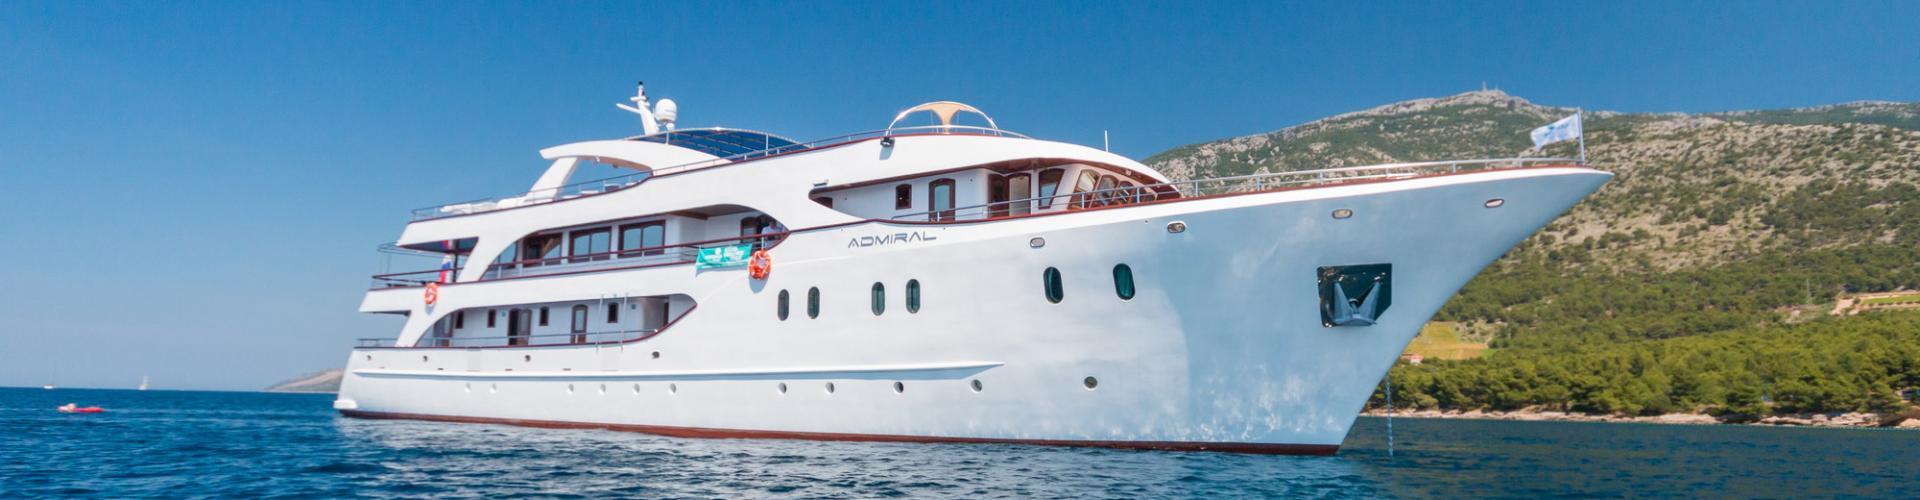 Deluxe cruiser MV Admiral- motor yacht